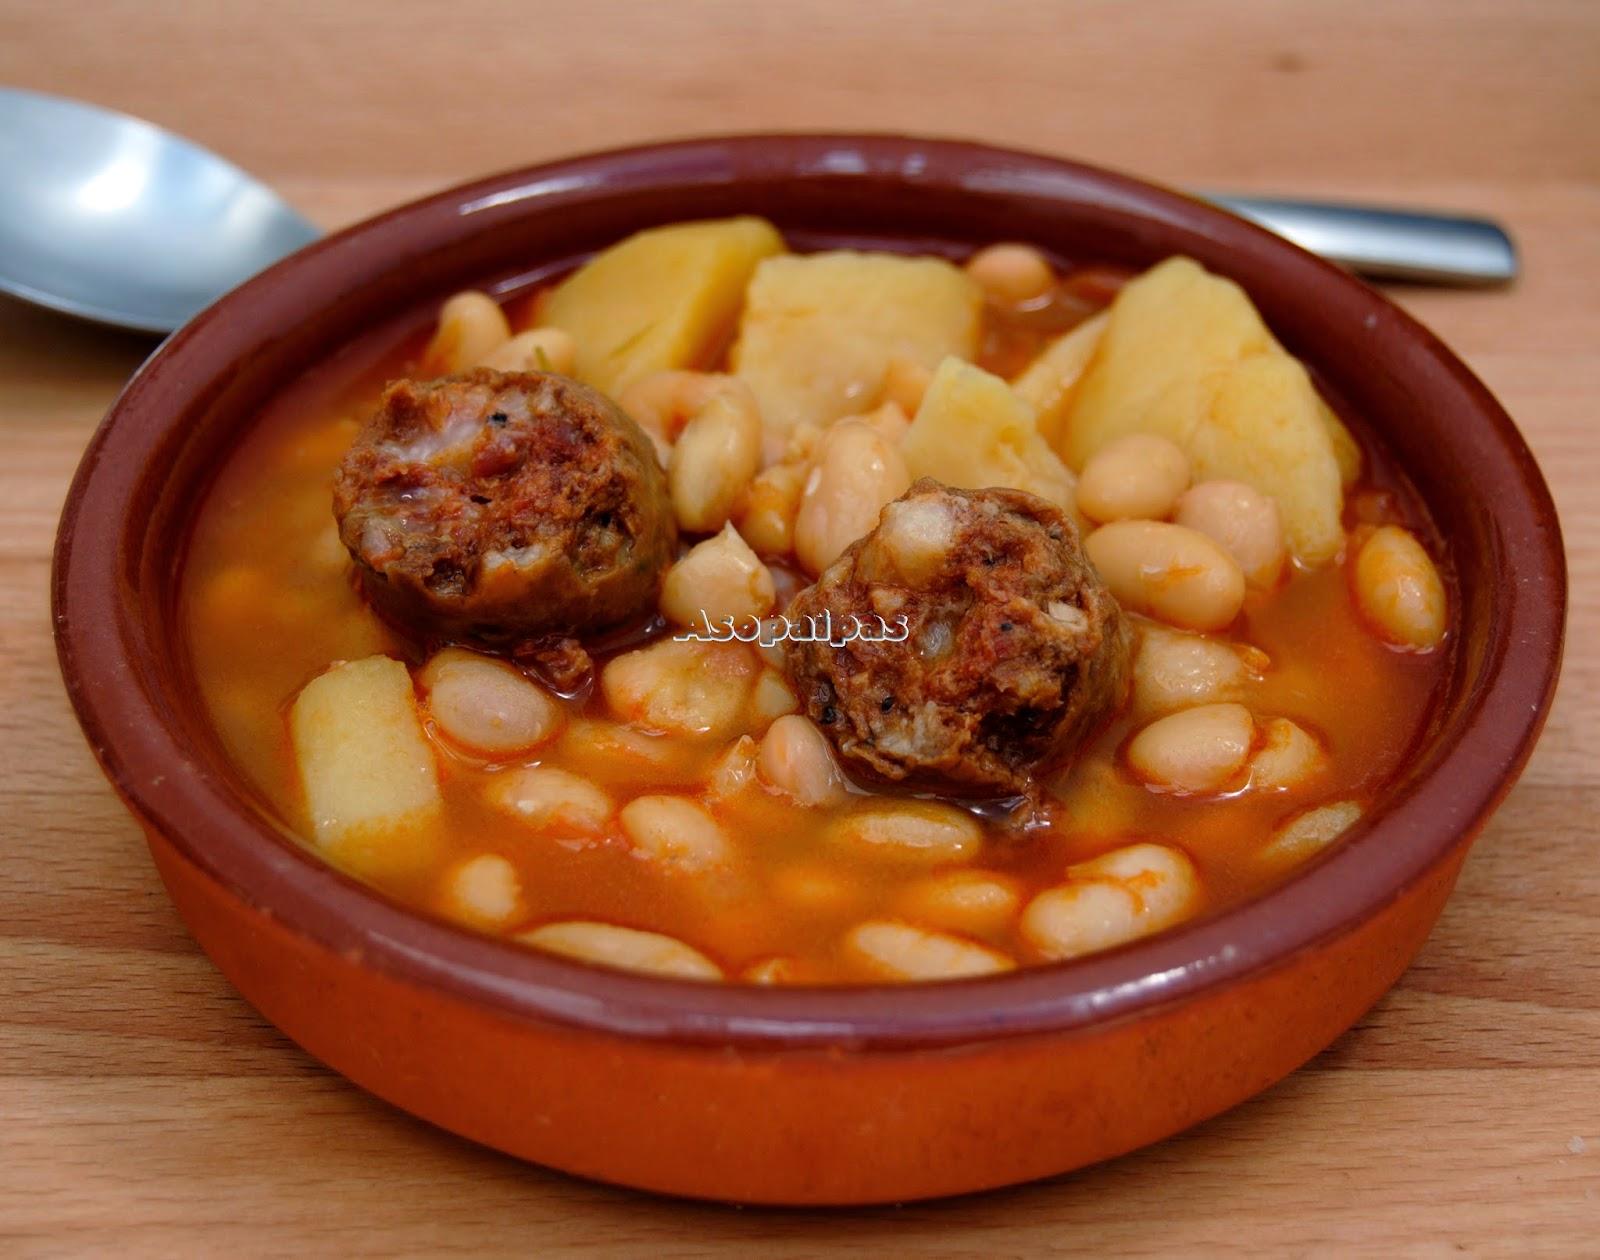 Potaje de jud as blancas con chorizo receta asopaipas - Judias con chorizo y patatas ...